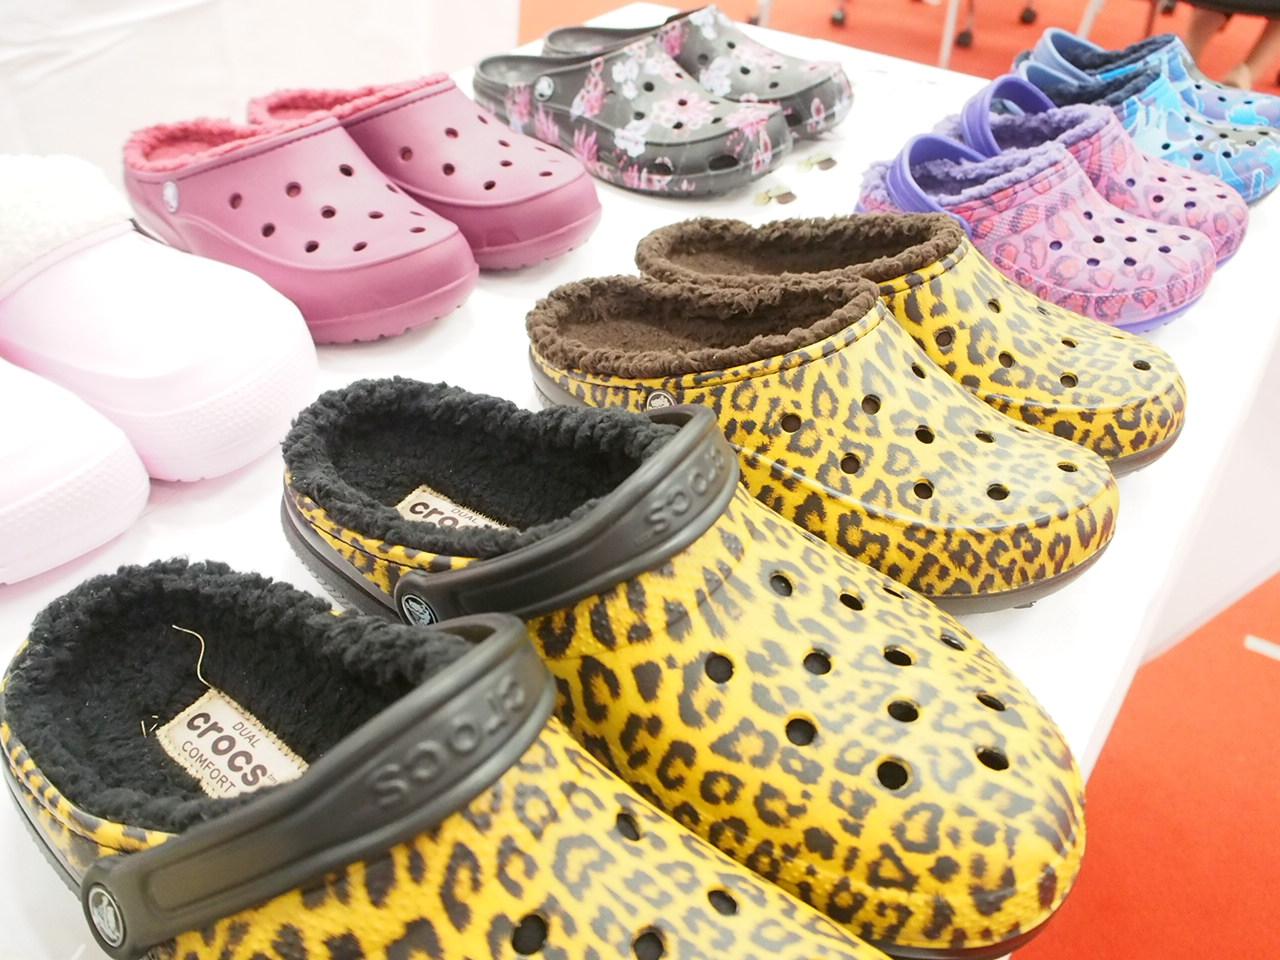 crocs(クロックス)を買うなら10月6日をチェックせよ!2,980円均一!送料無料